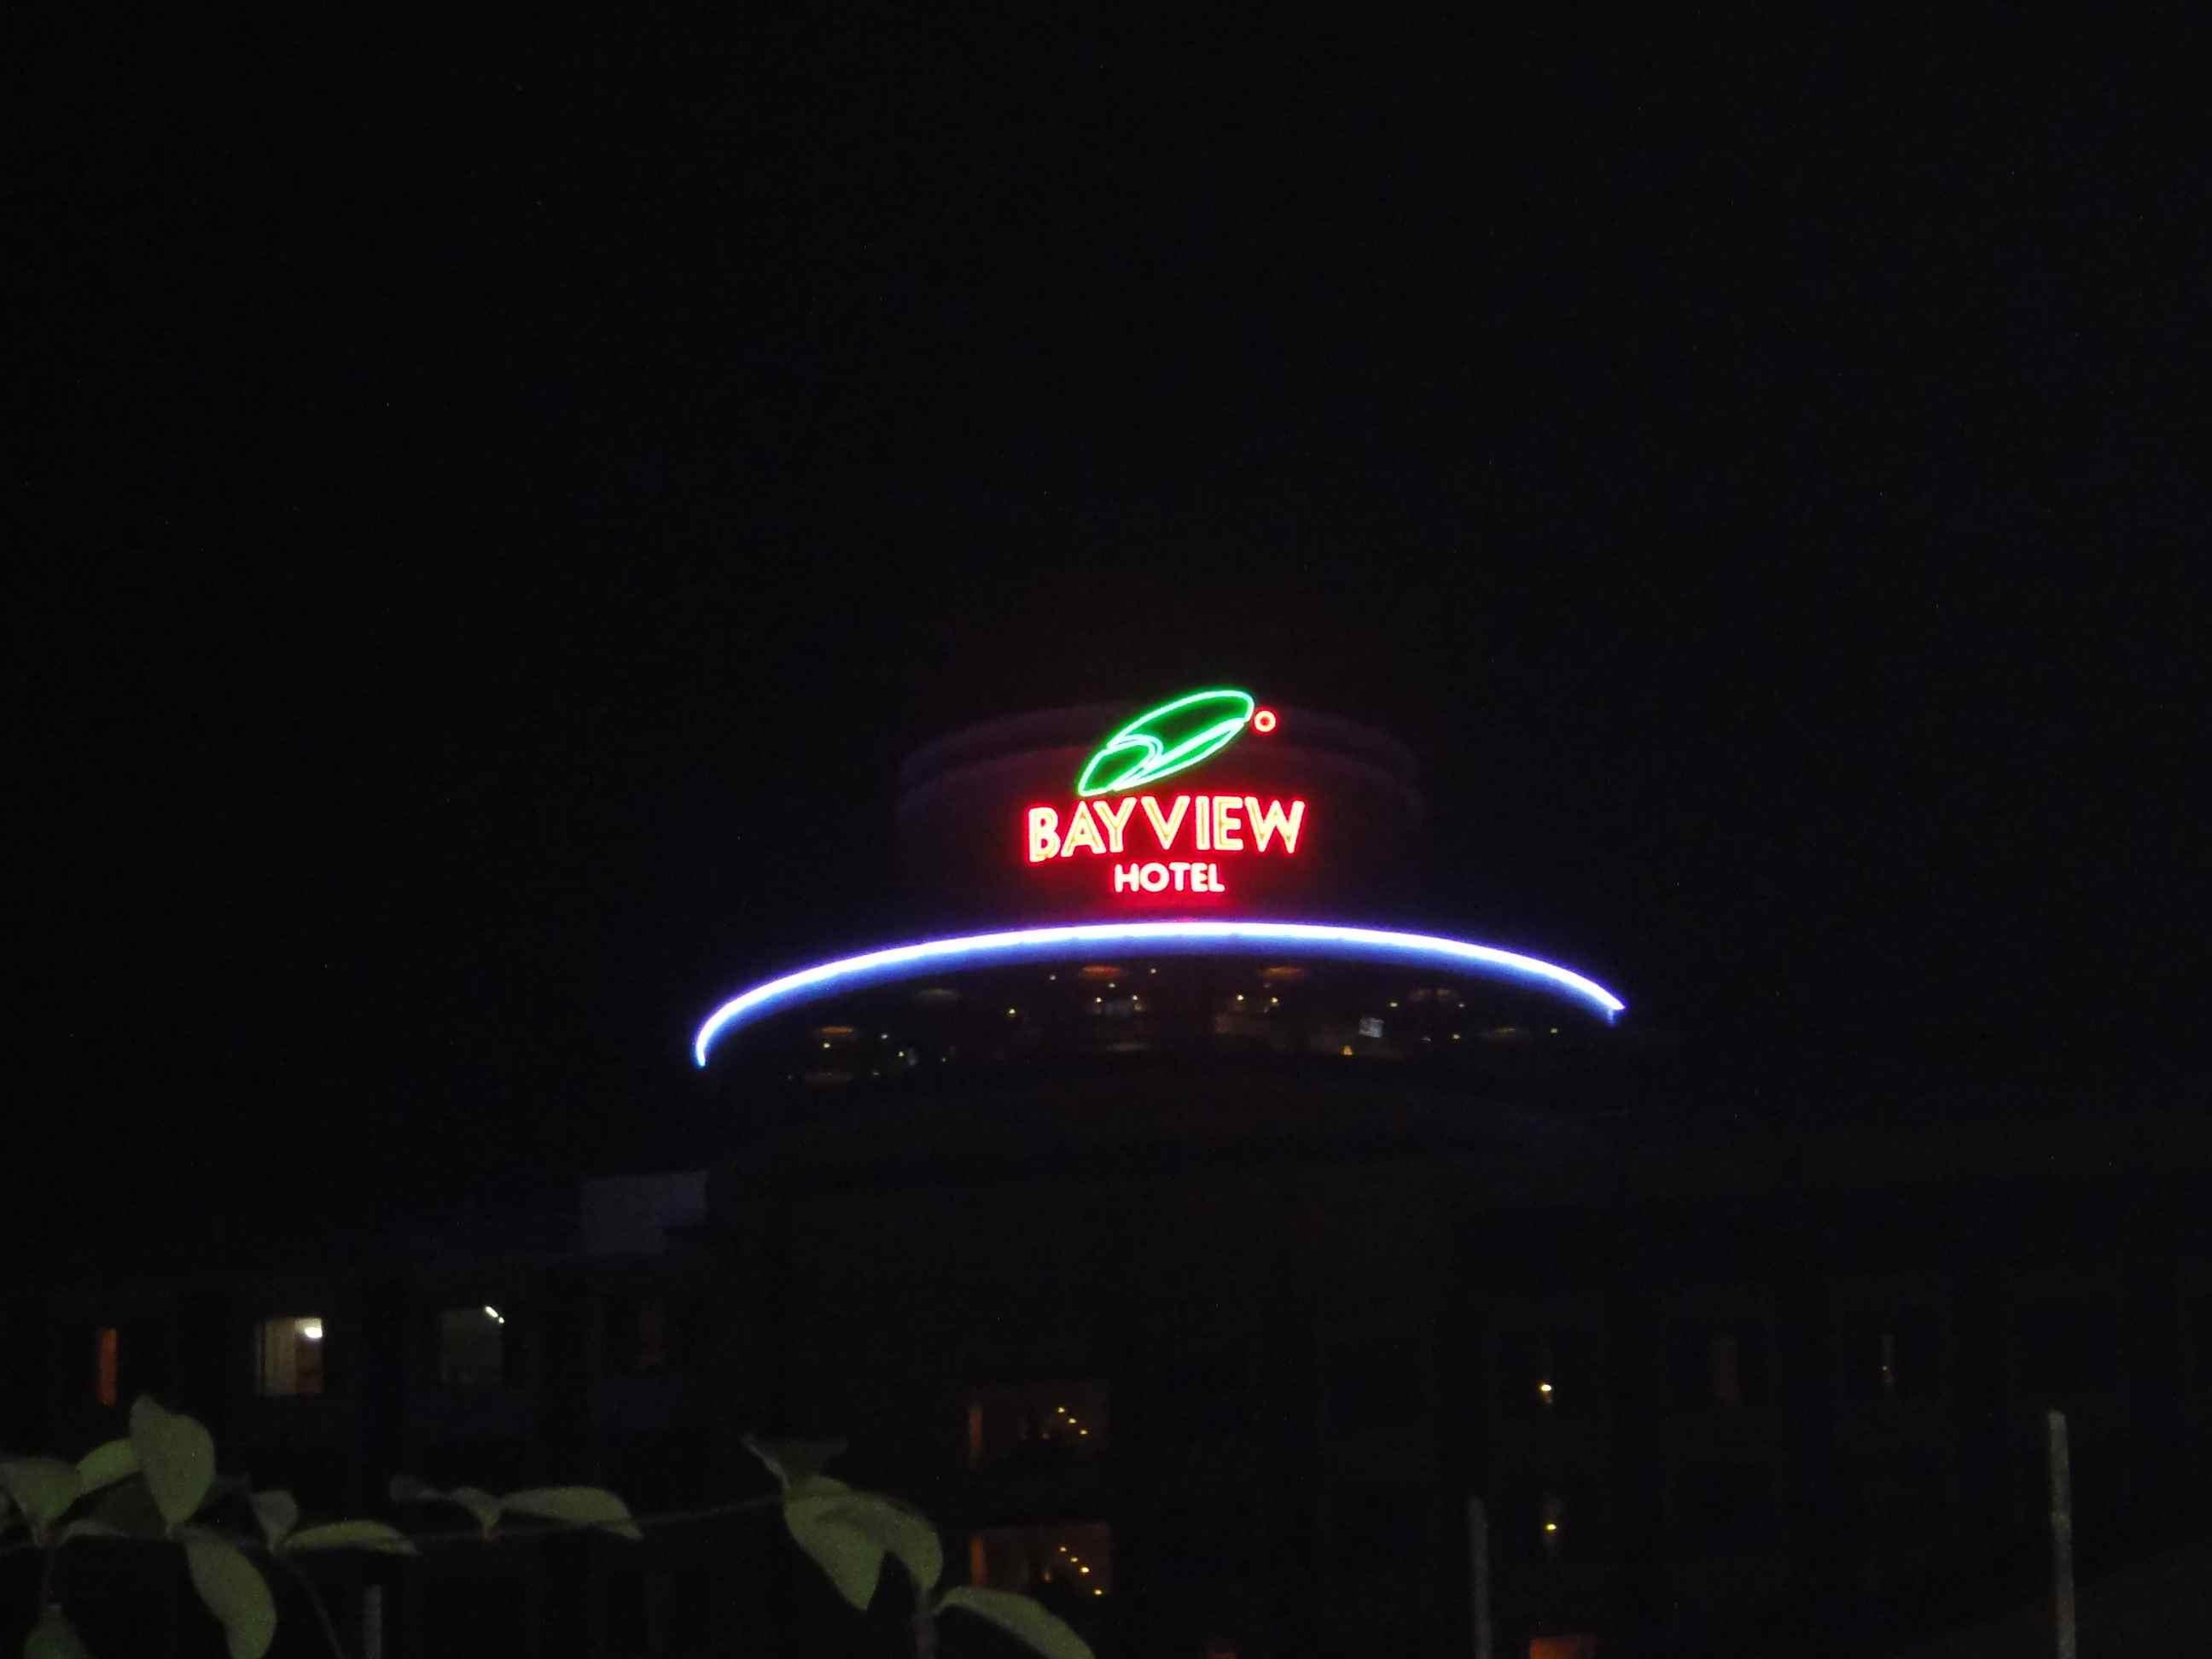 bayview muslim single men Single muslim at islamicmarriagecom single muslim women & men in the uk,  usa, canada, europe join now for free.